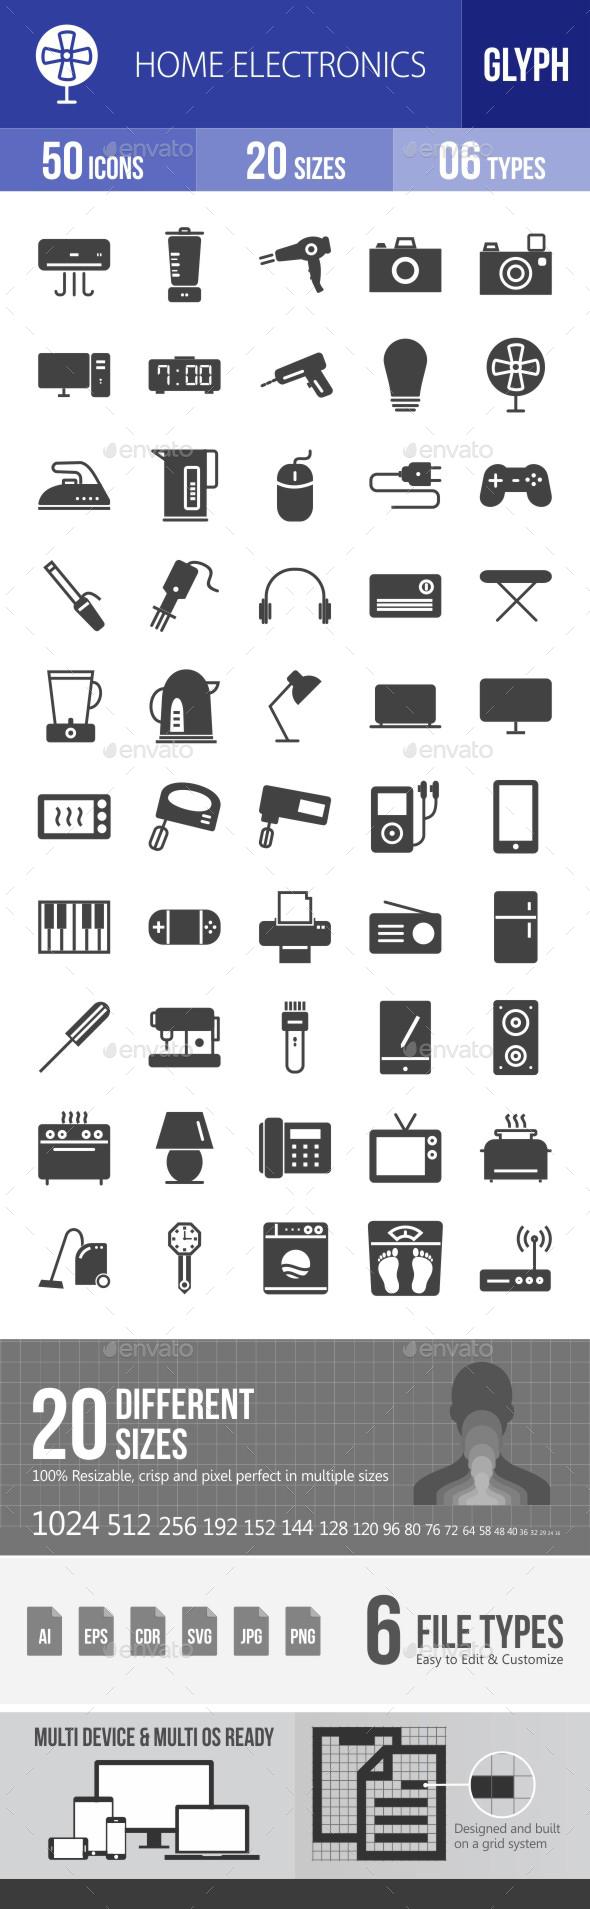 Home Electronics Glyph Icons - Icons